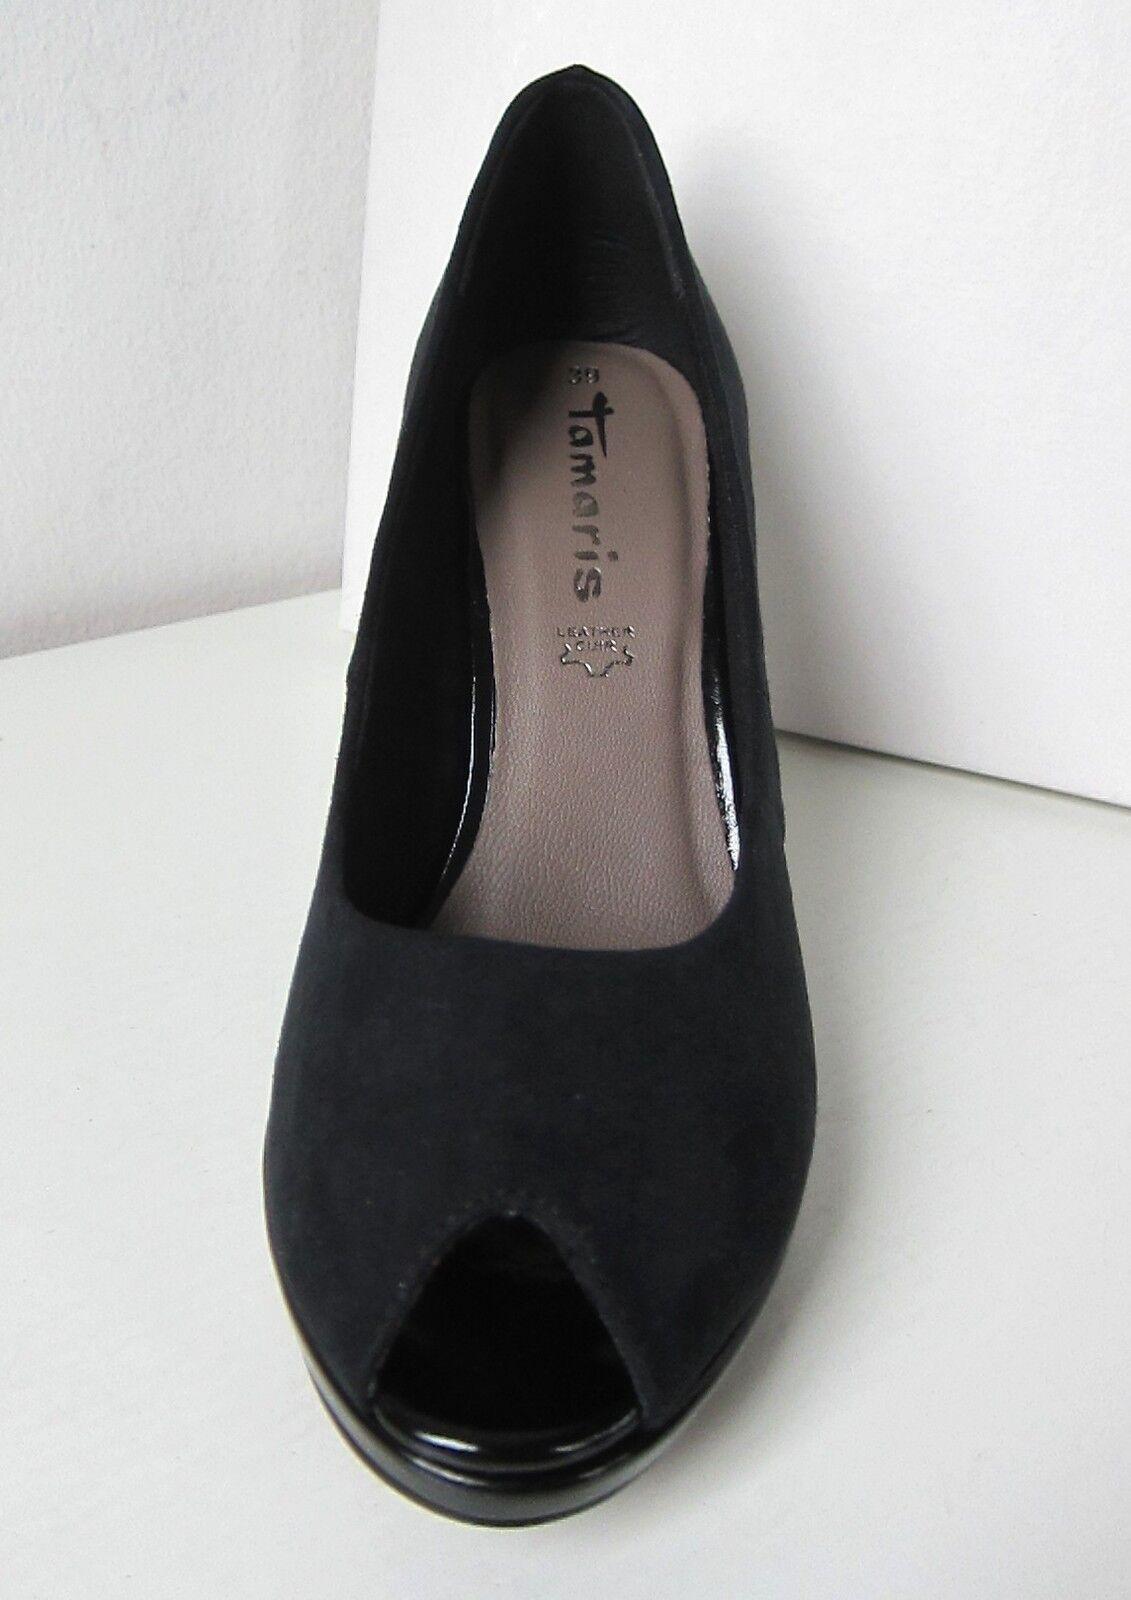 Tamaris PLATEAU PUMPS Peep Toe Textil 1 29305 20 007 Black